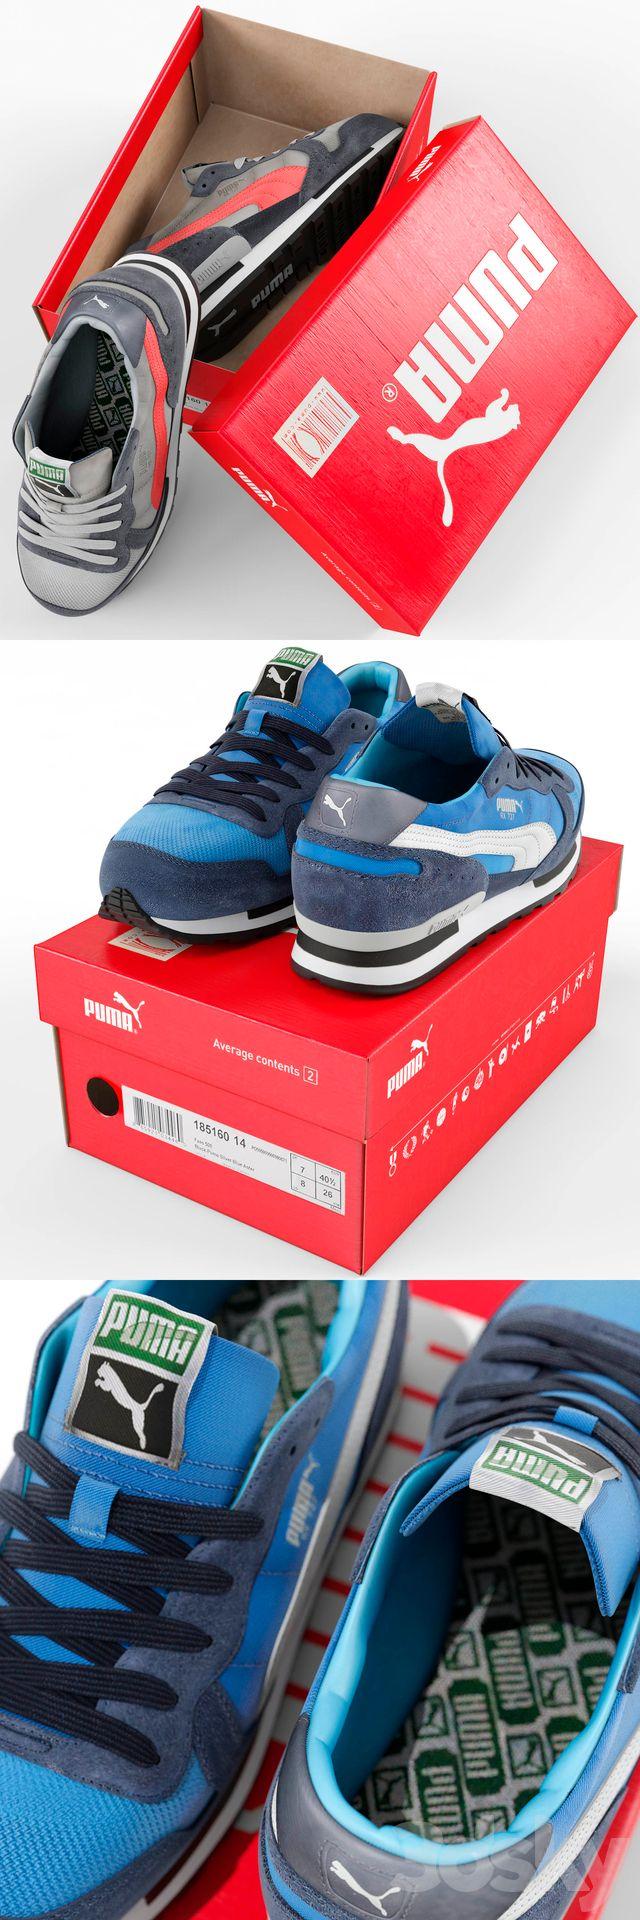 مدل سه بعدی کفش اسپورت پوما